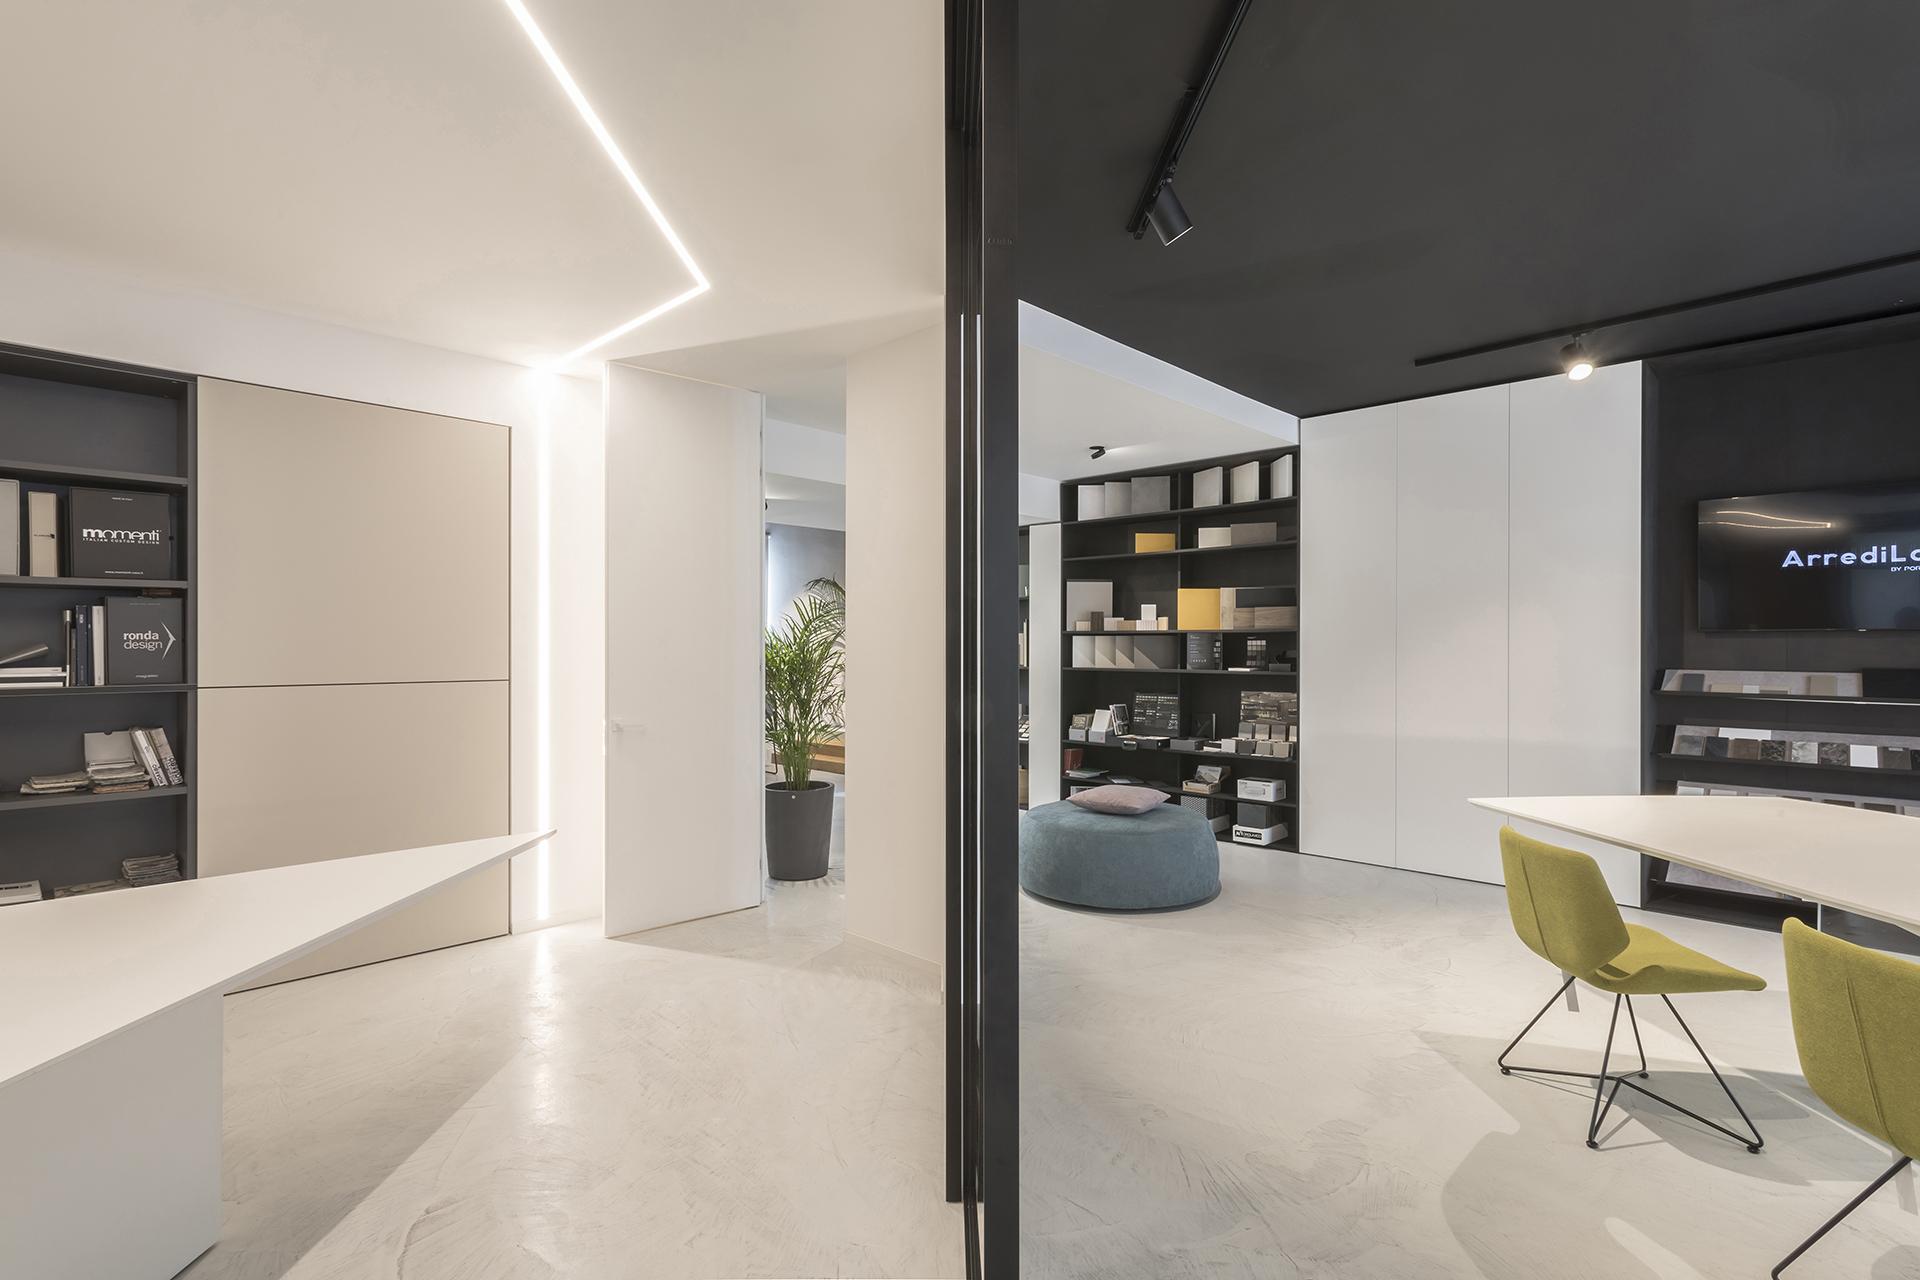 DFG-Architetti-Associati_showroom-Arredi-Lab-8